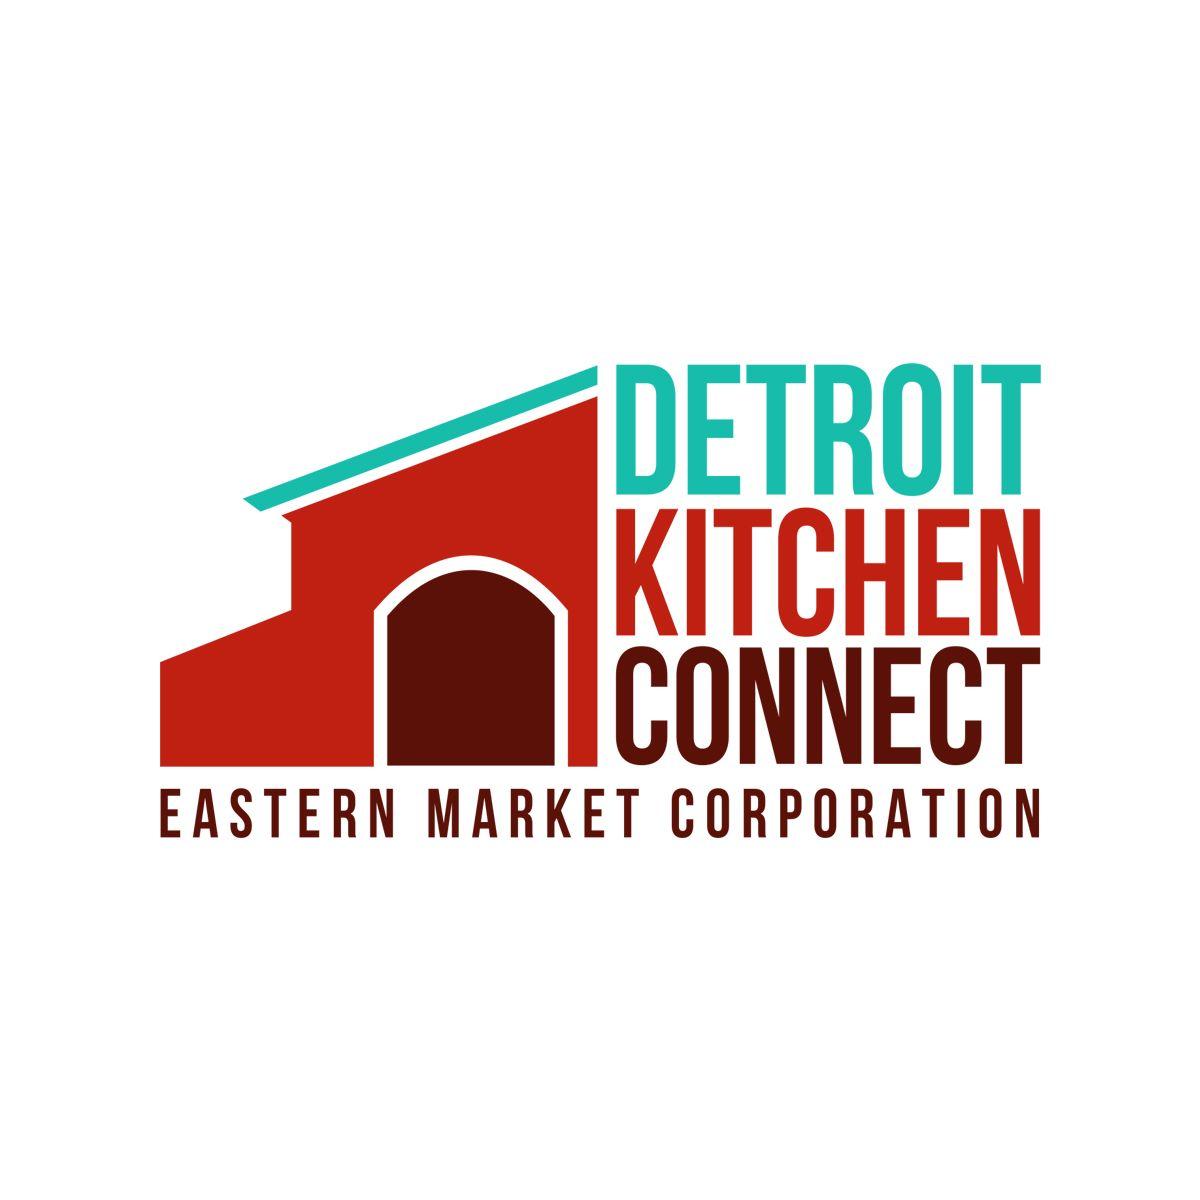 DetroitKitchenConnect-TOL-2019